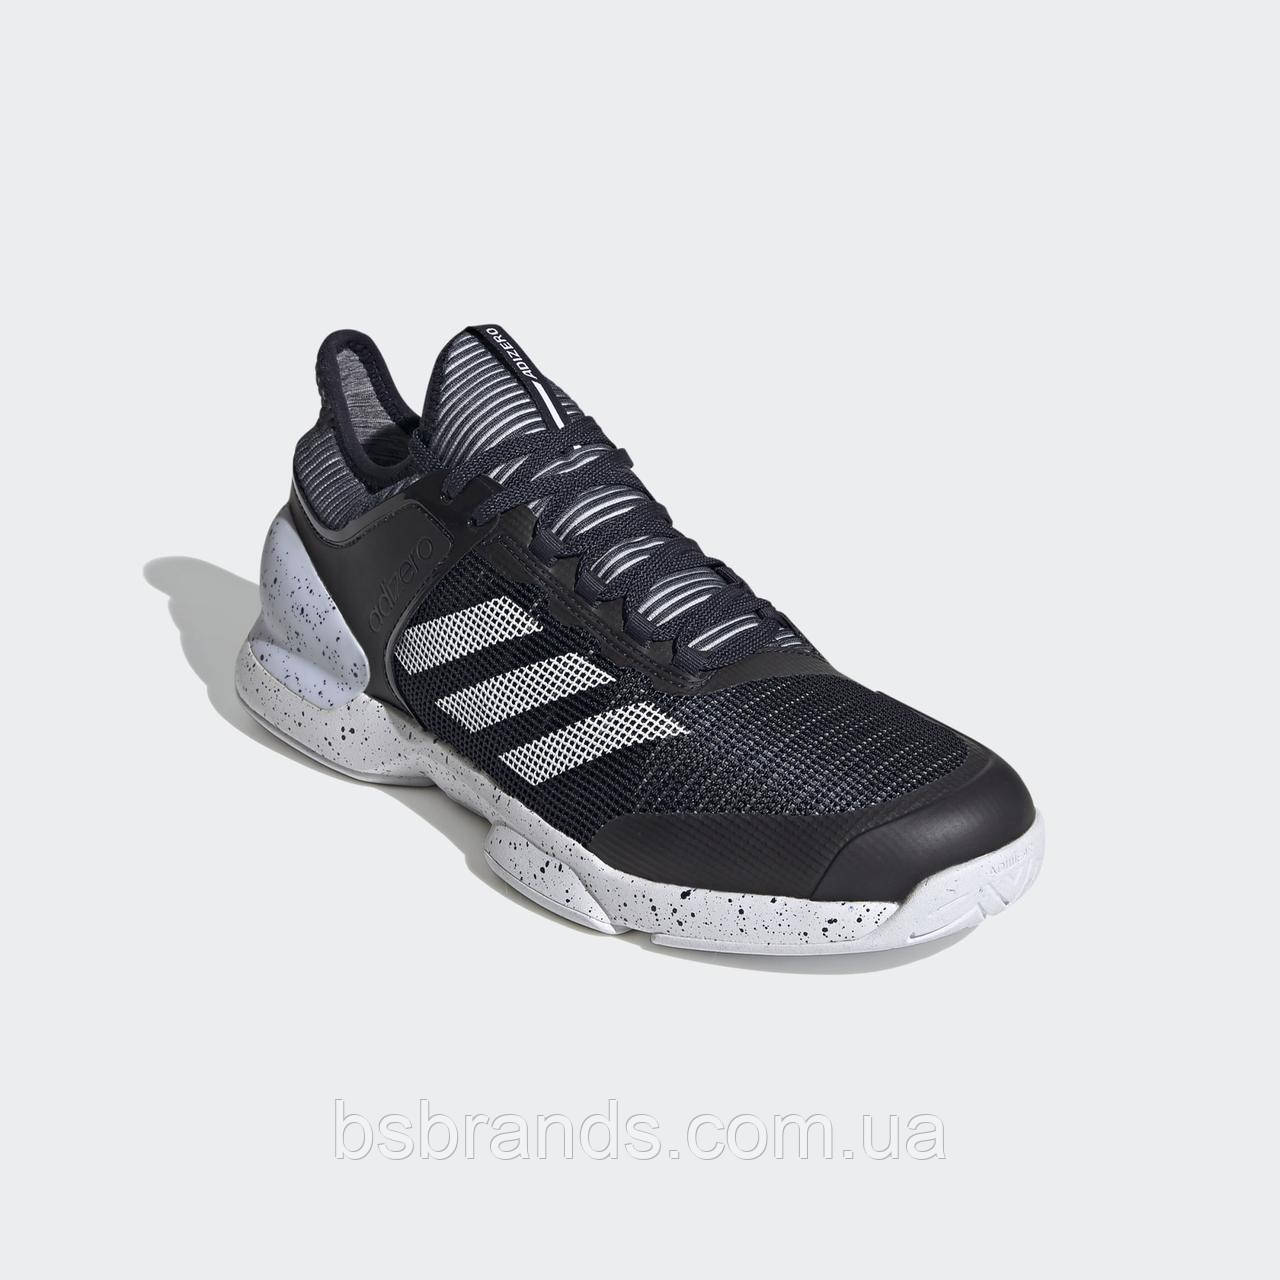 Мужские кроссовки адидас для тенниса Ubersonic 2 Hard Court FW0066 (2020/2)